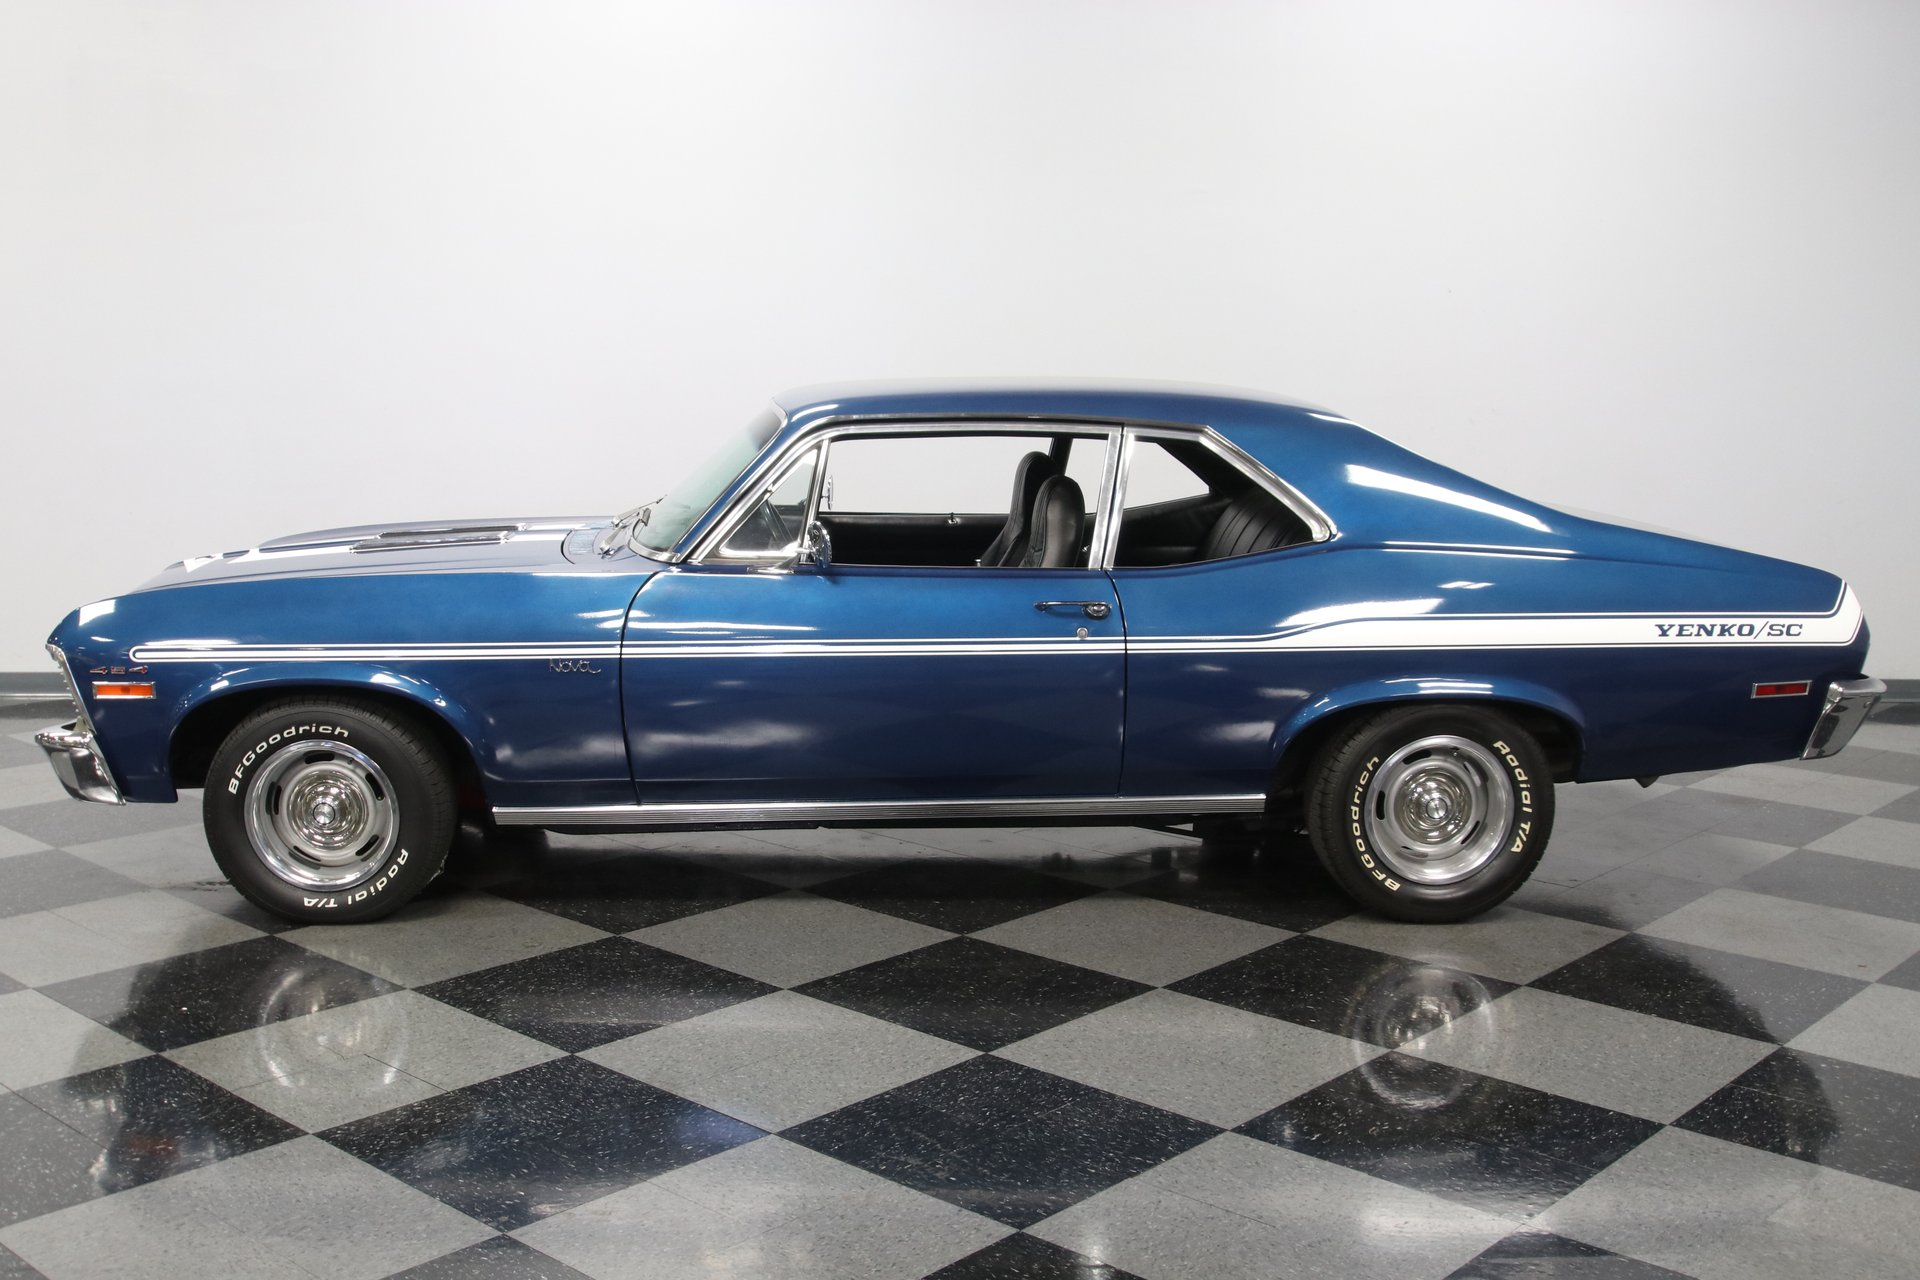 1971 chevrolet nova ss 454